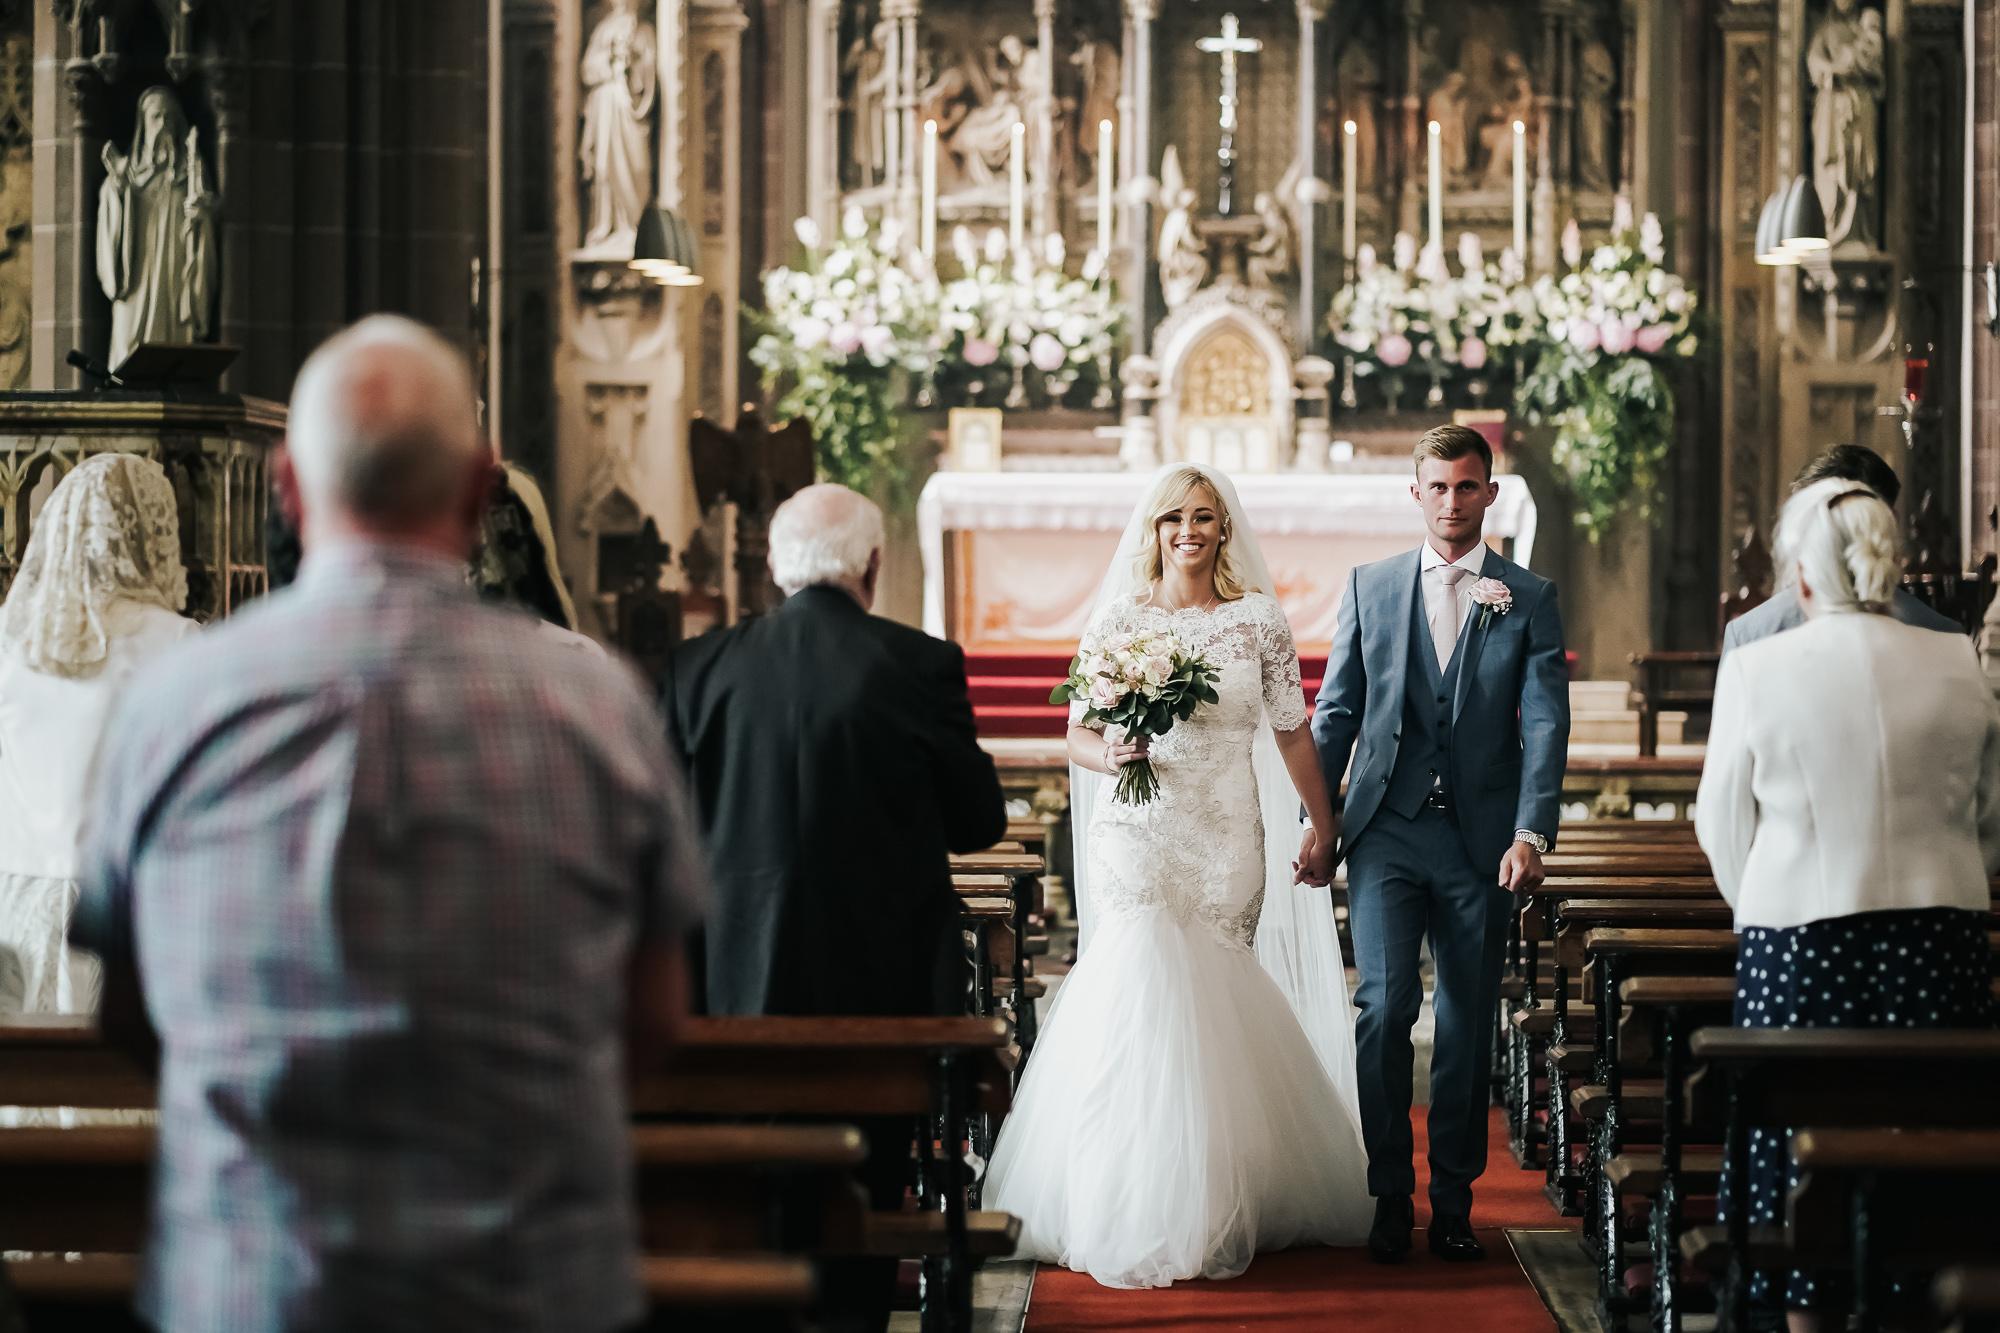 Thornton Manor Lakeside Marquee Wedding Photographer  (25 of 53).jpg